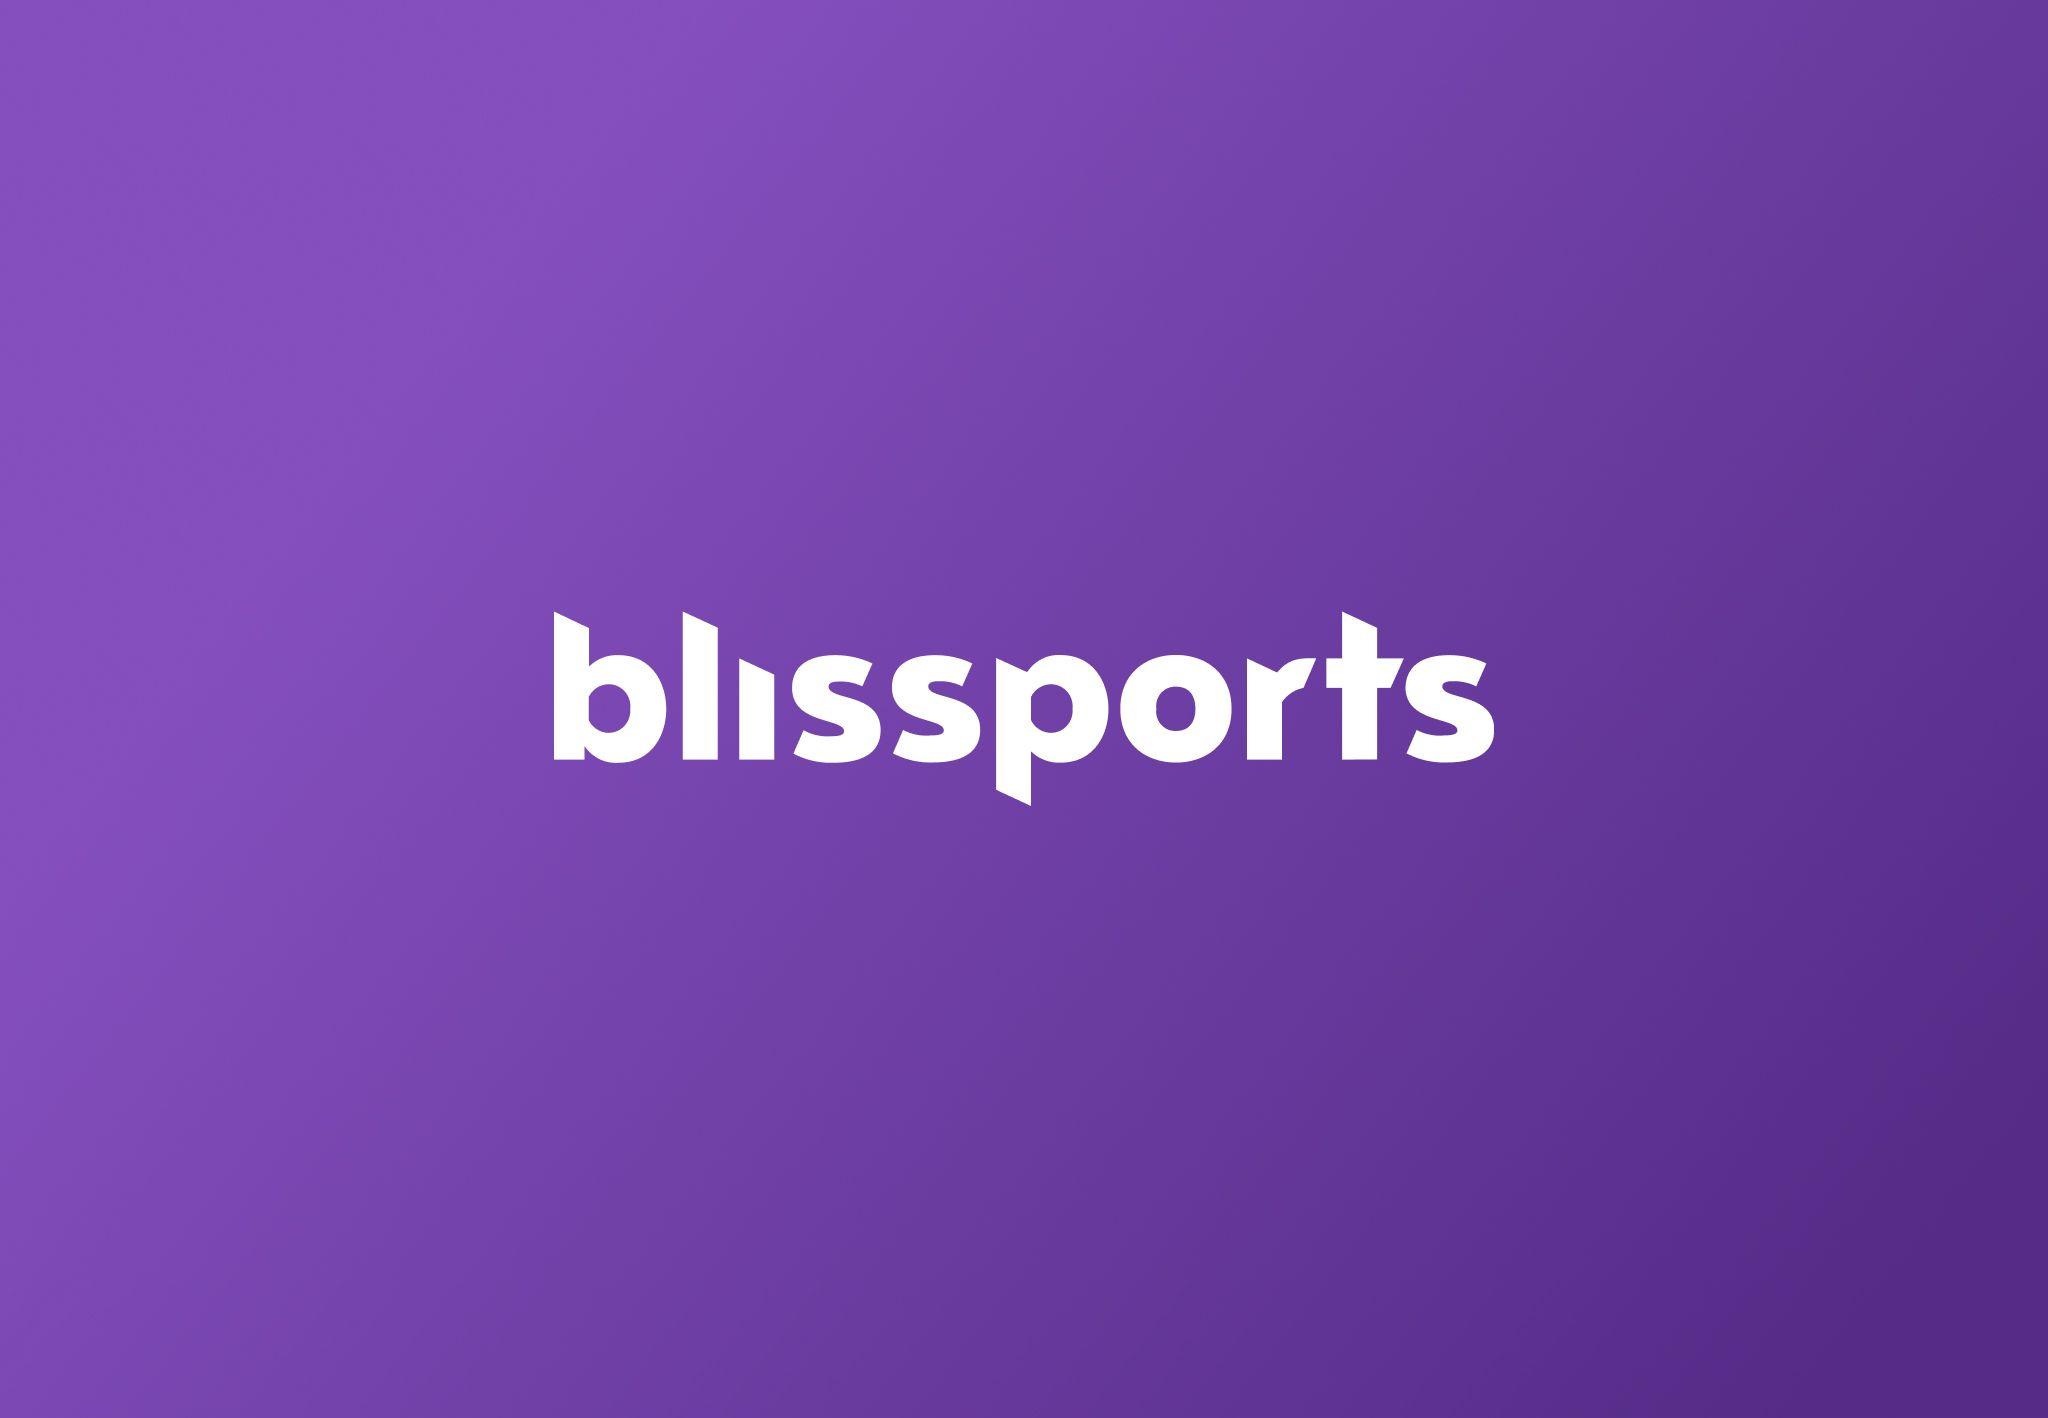 Blissports